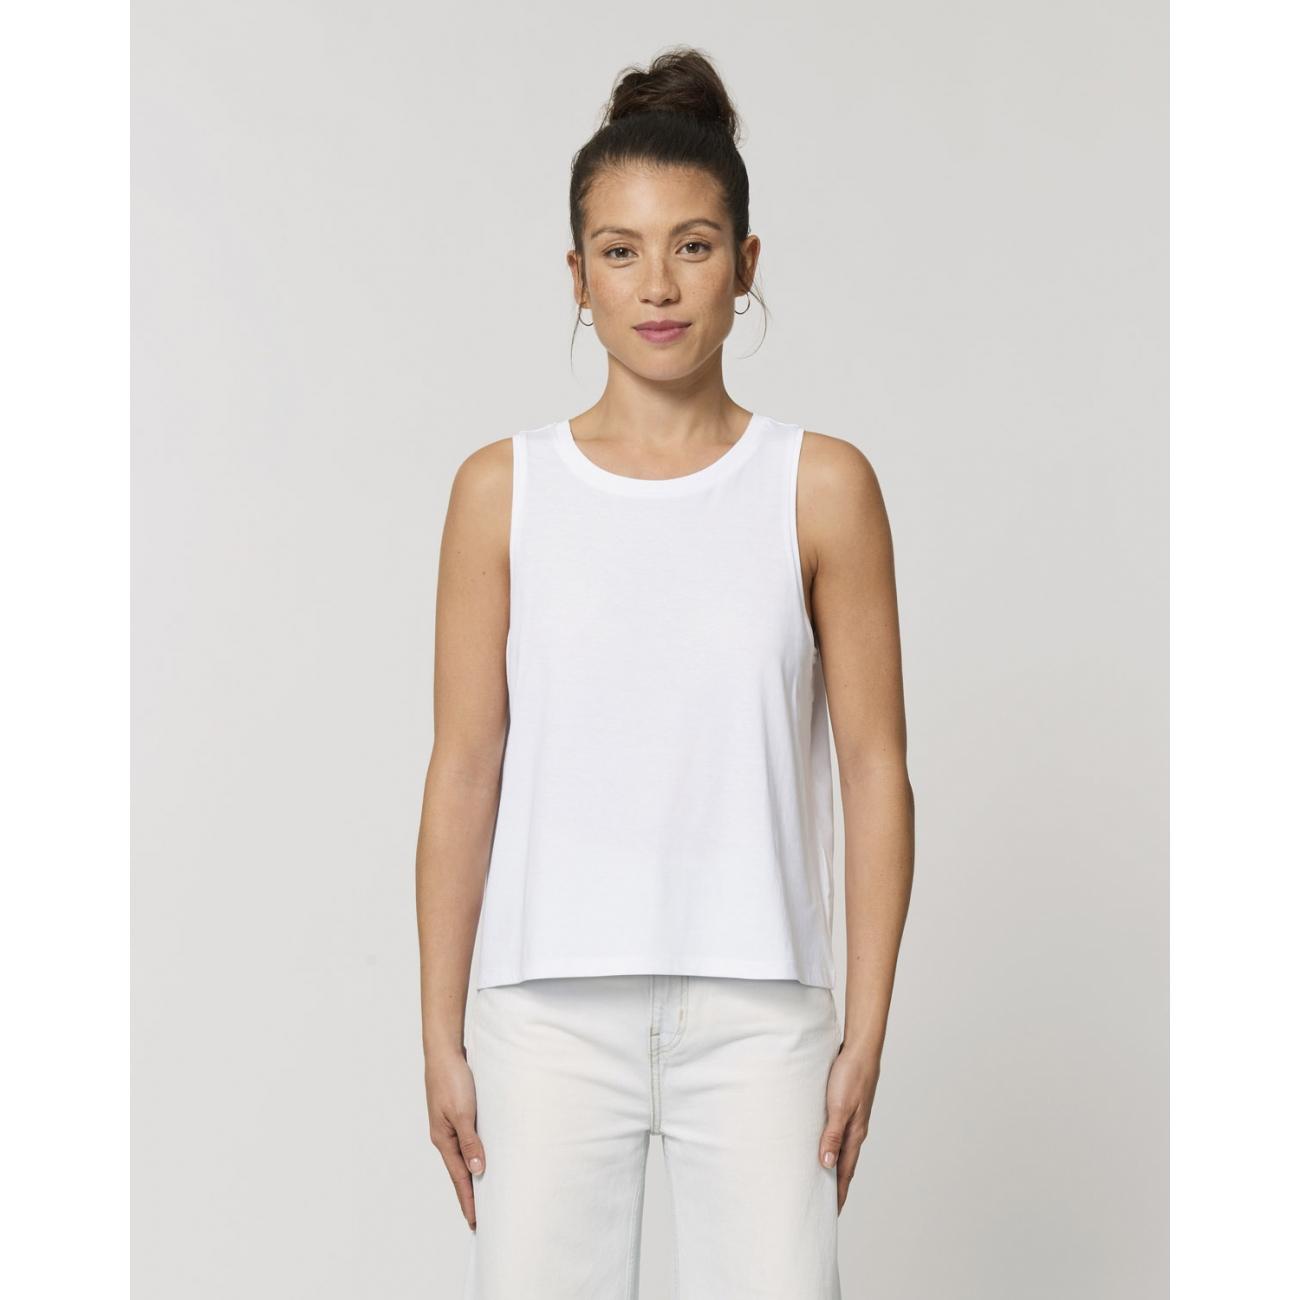 https://tee-shirt-bio.com/8745-thickbox_default/debardeur-femme-coton-bio-blanc-debardeur-court-dancer.jpg